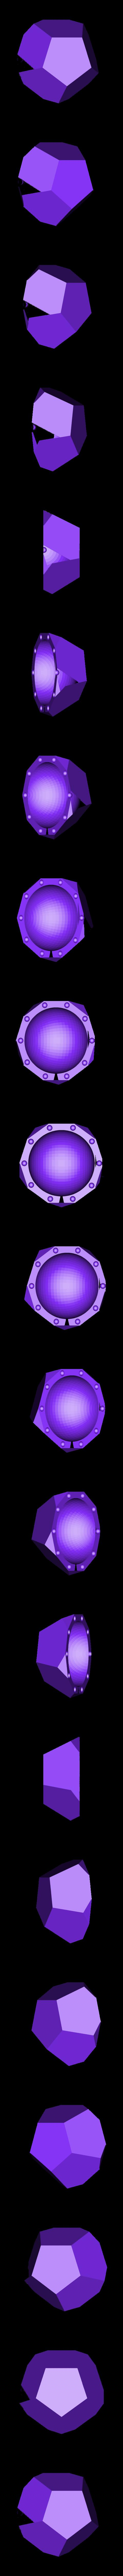 ring-box-top.obj Download OBJ file Dodecahedron case • 3D print model, plasmeo3d